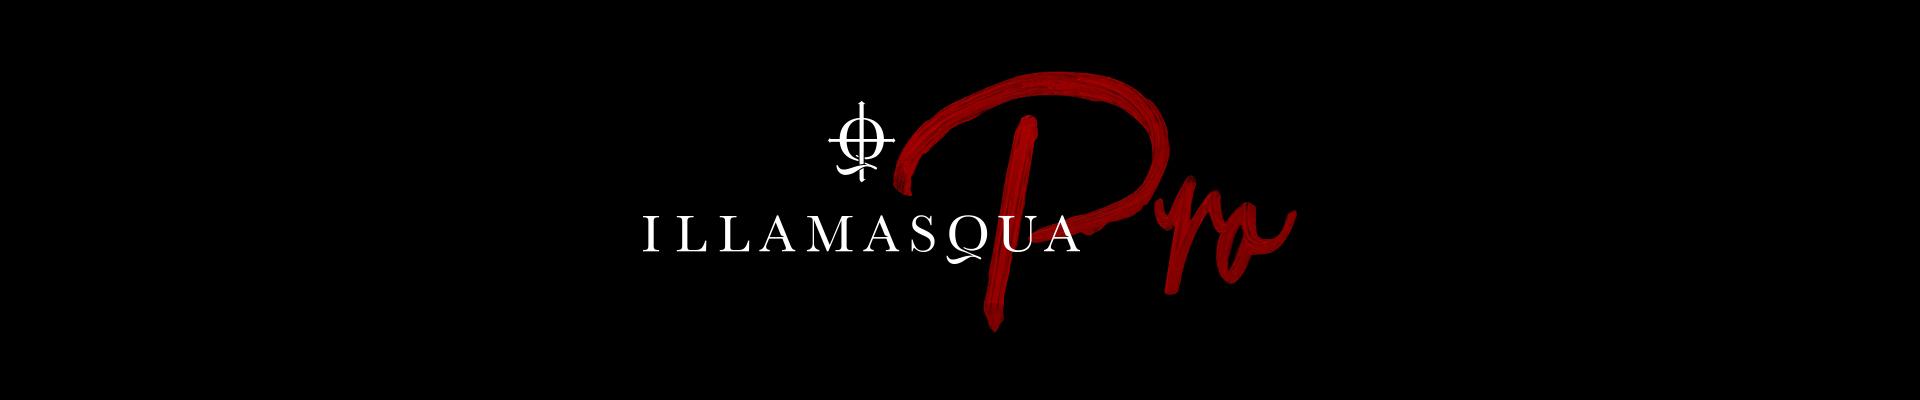 Illamasqua Pro Banner